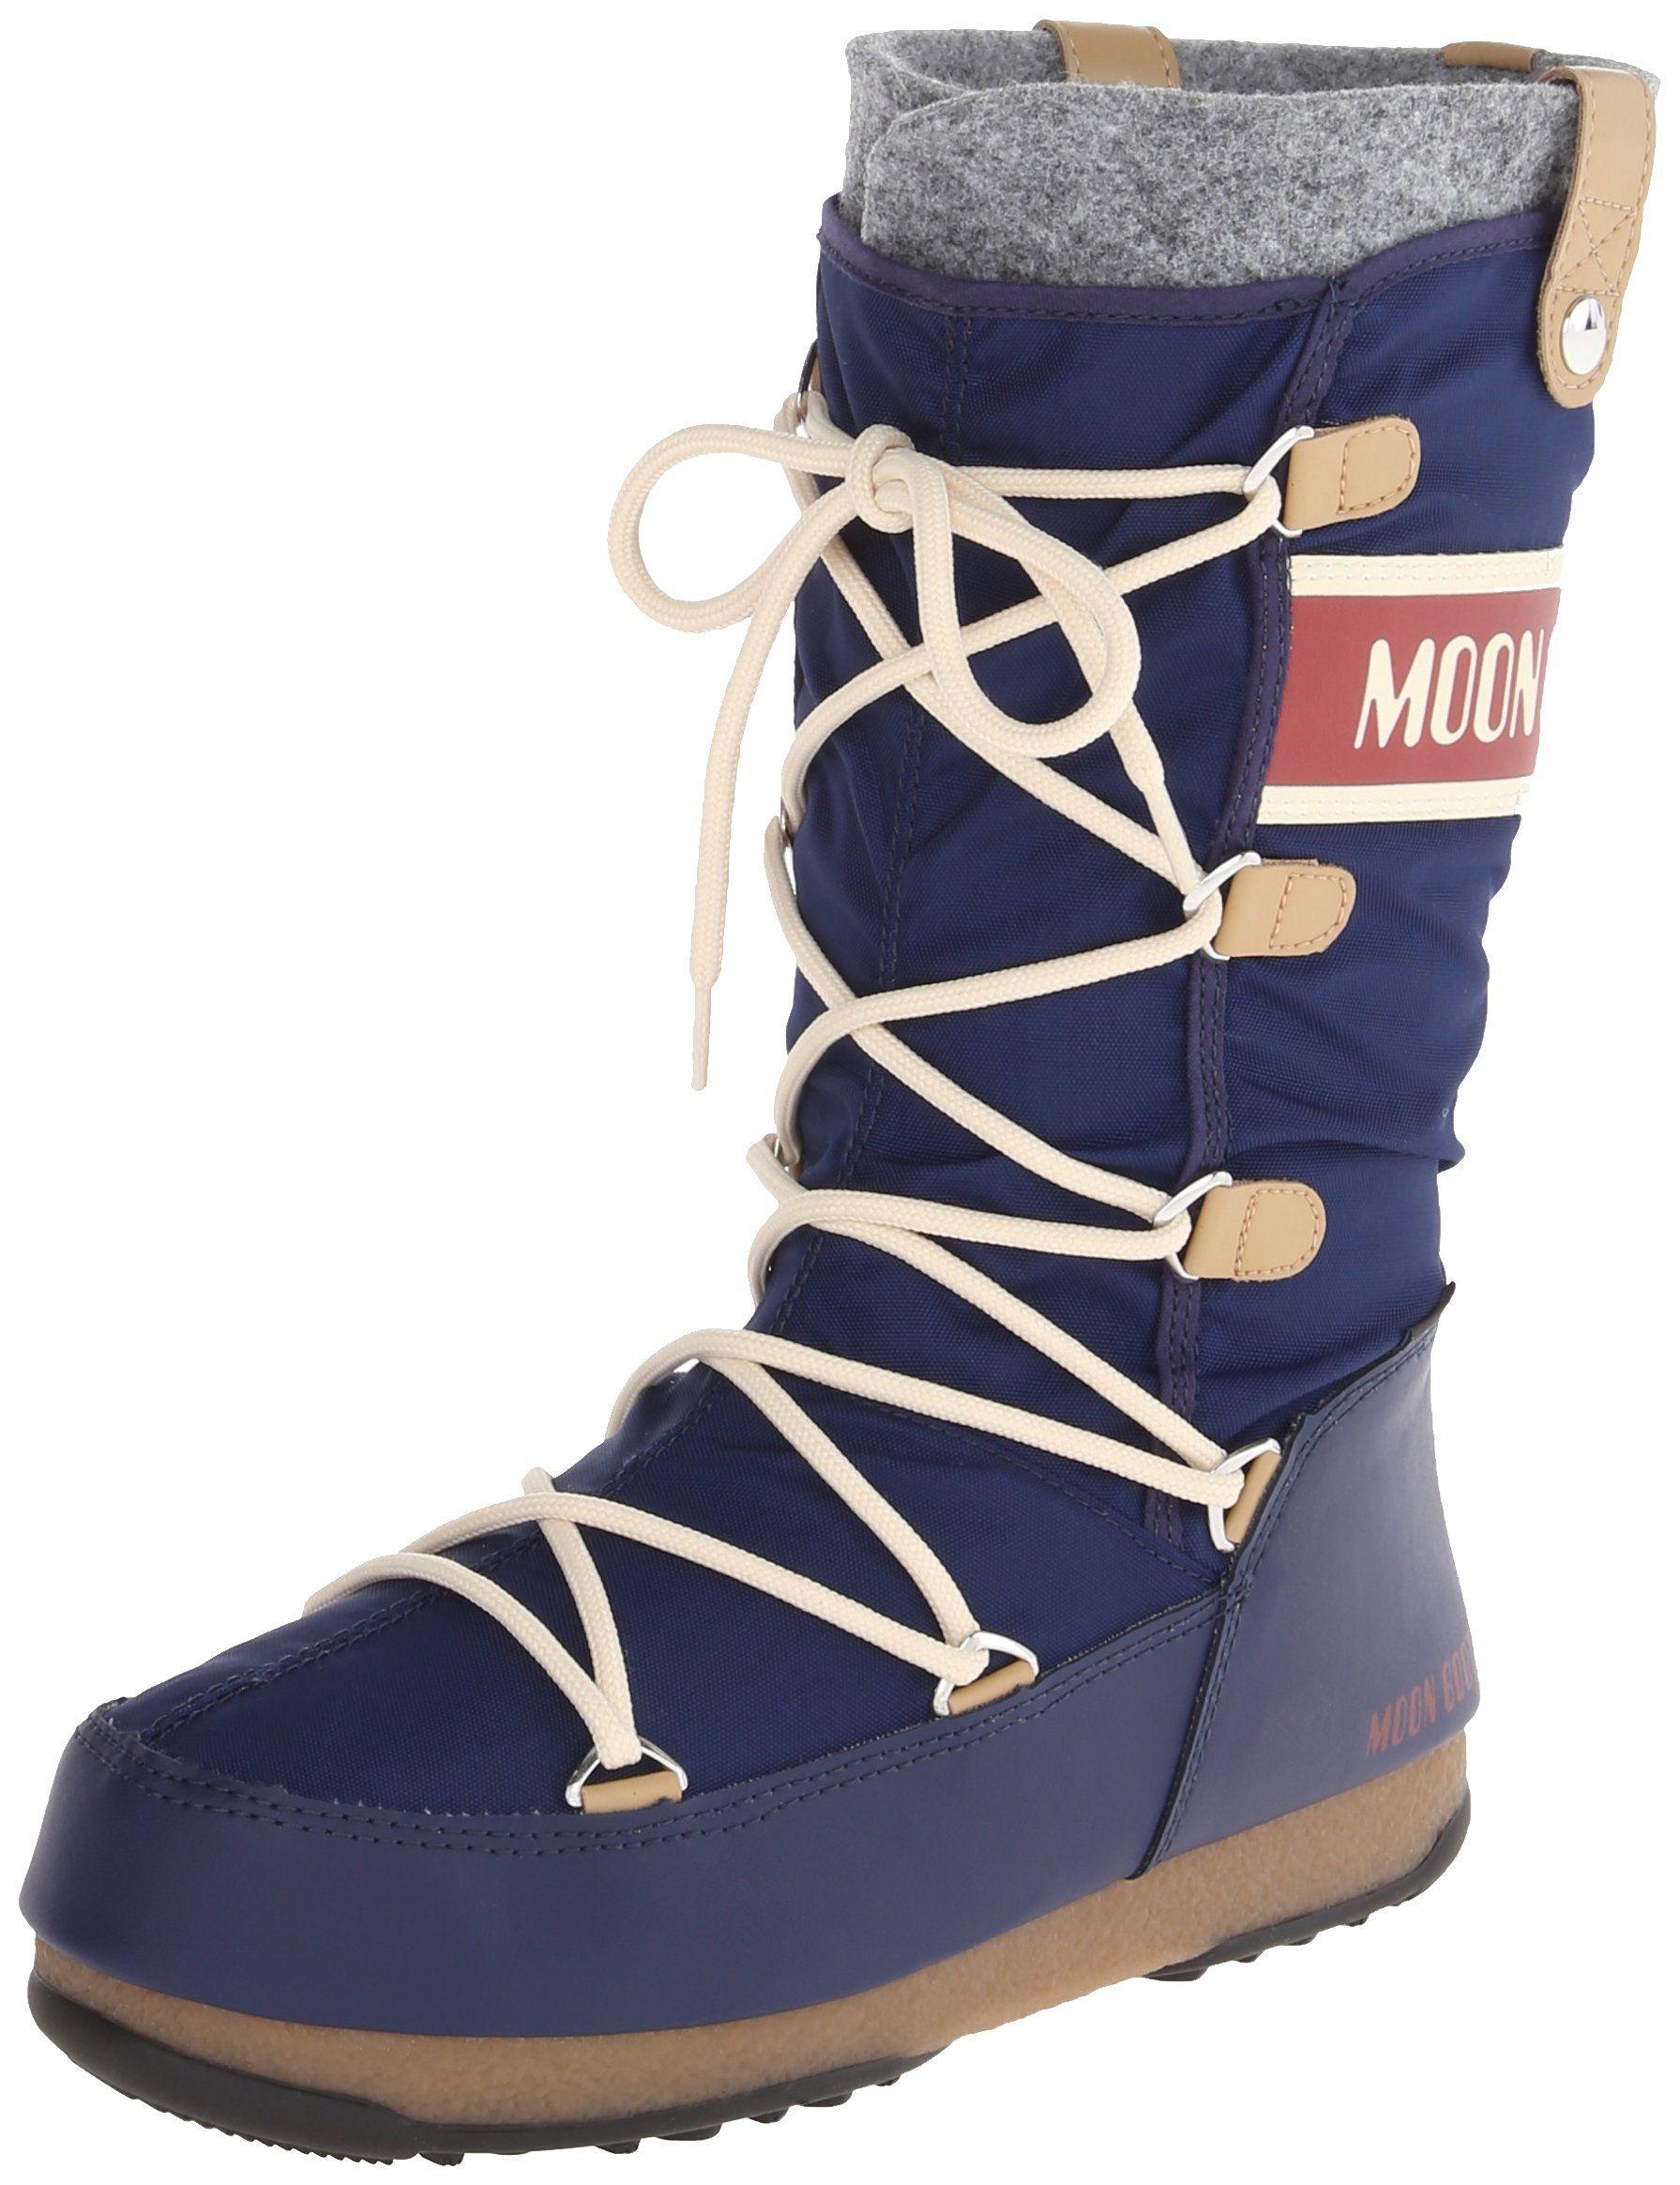 quality design 5a998 45fb5 Tecnica Women's Monaco Felt Moon Winter Boot | Amazon.com ...